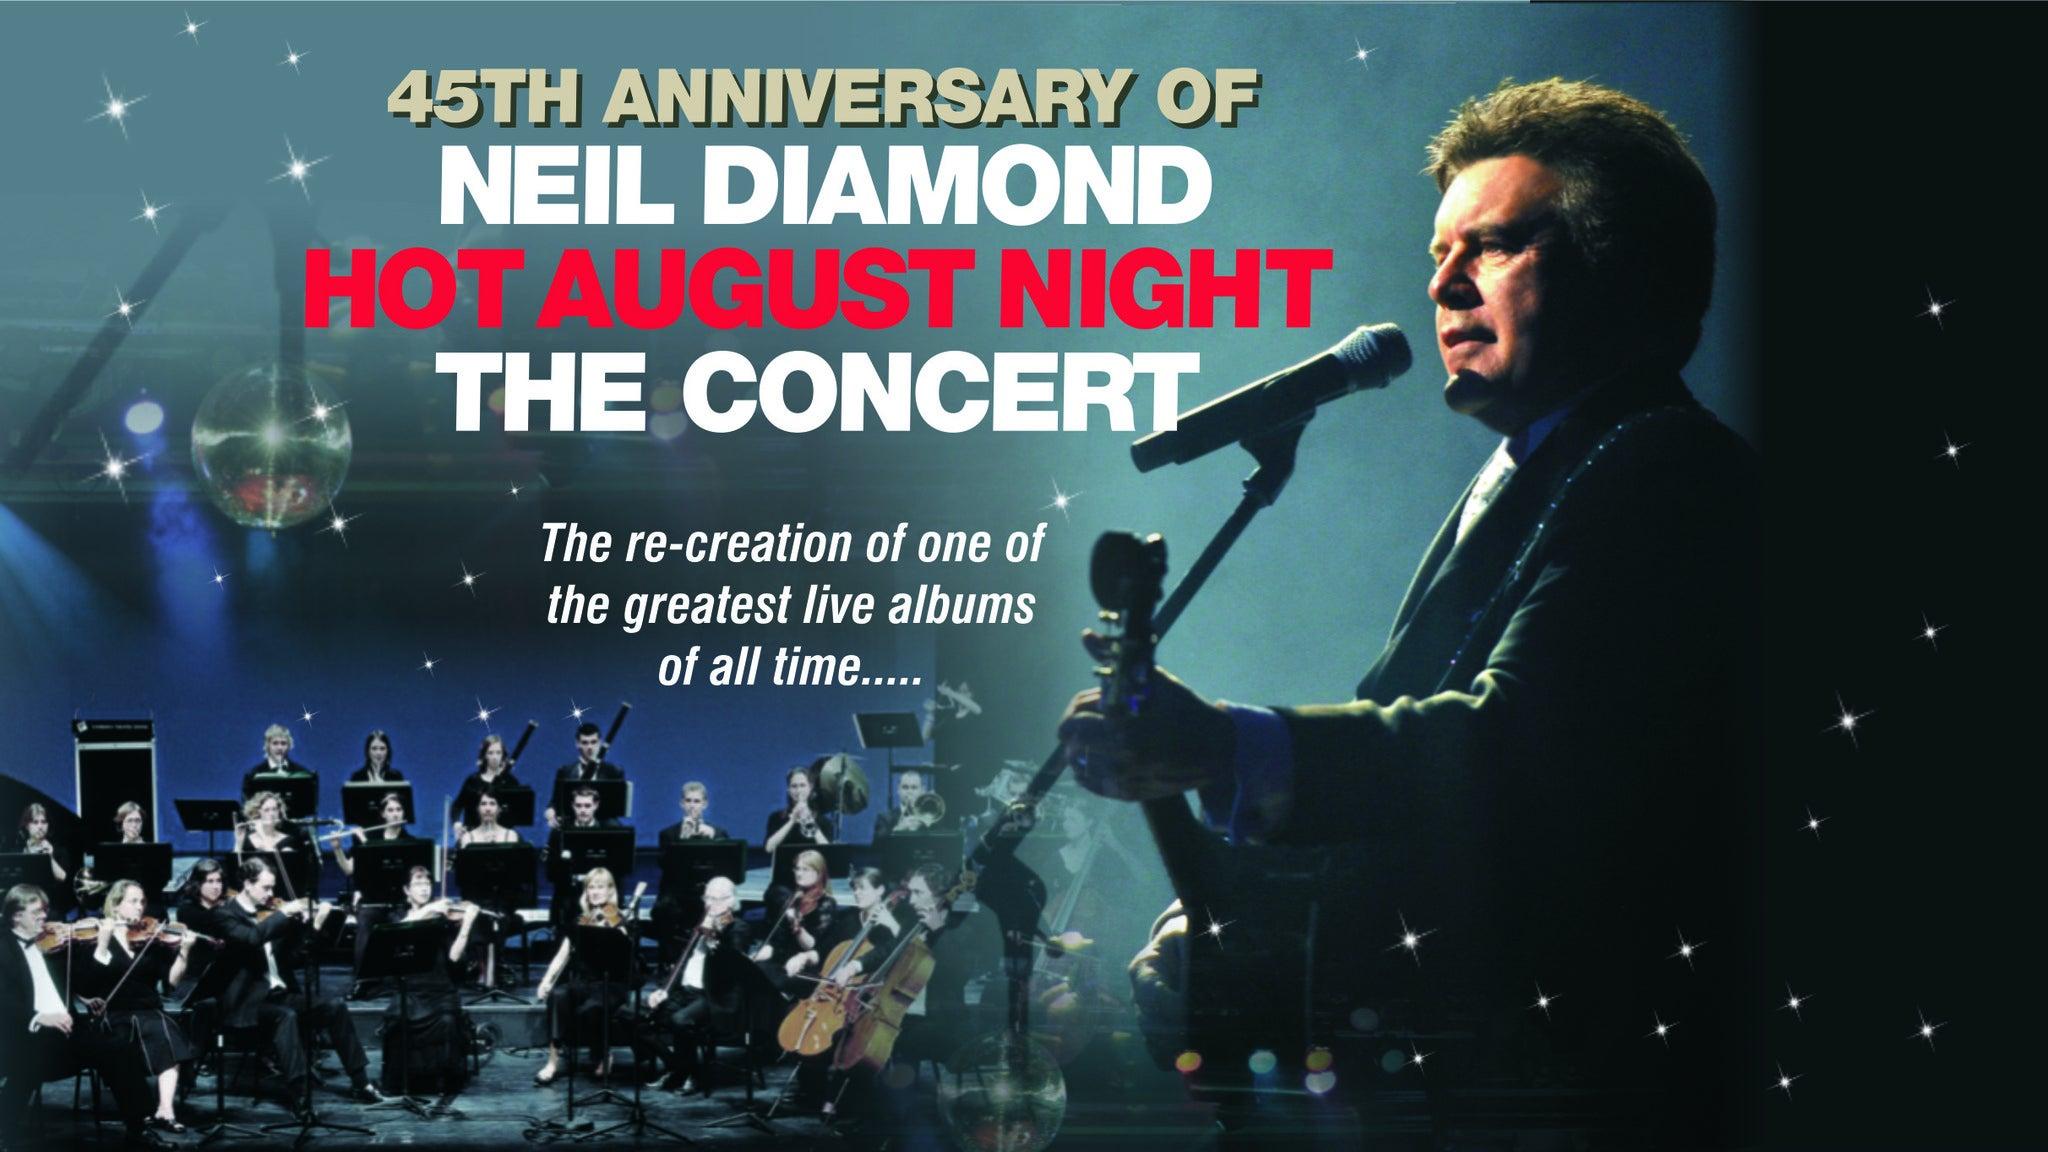 Neil Diamond Tribute Show at Acs Lounge - Soboba Casino